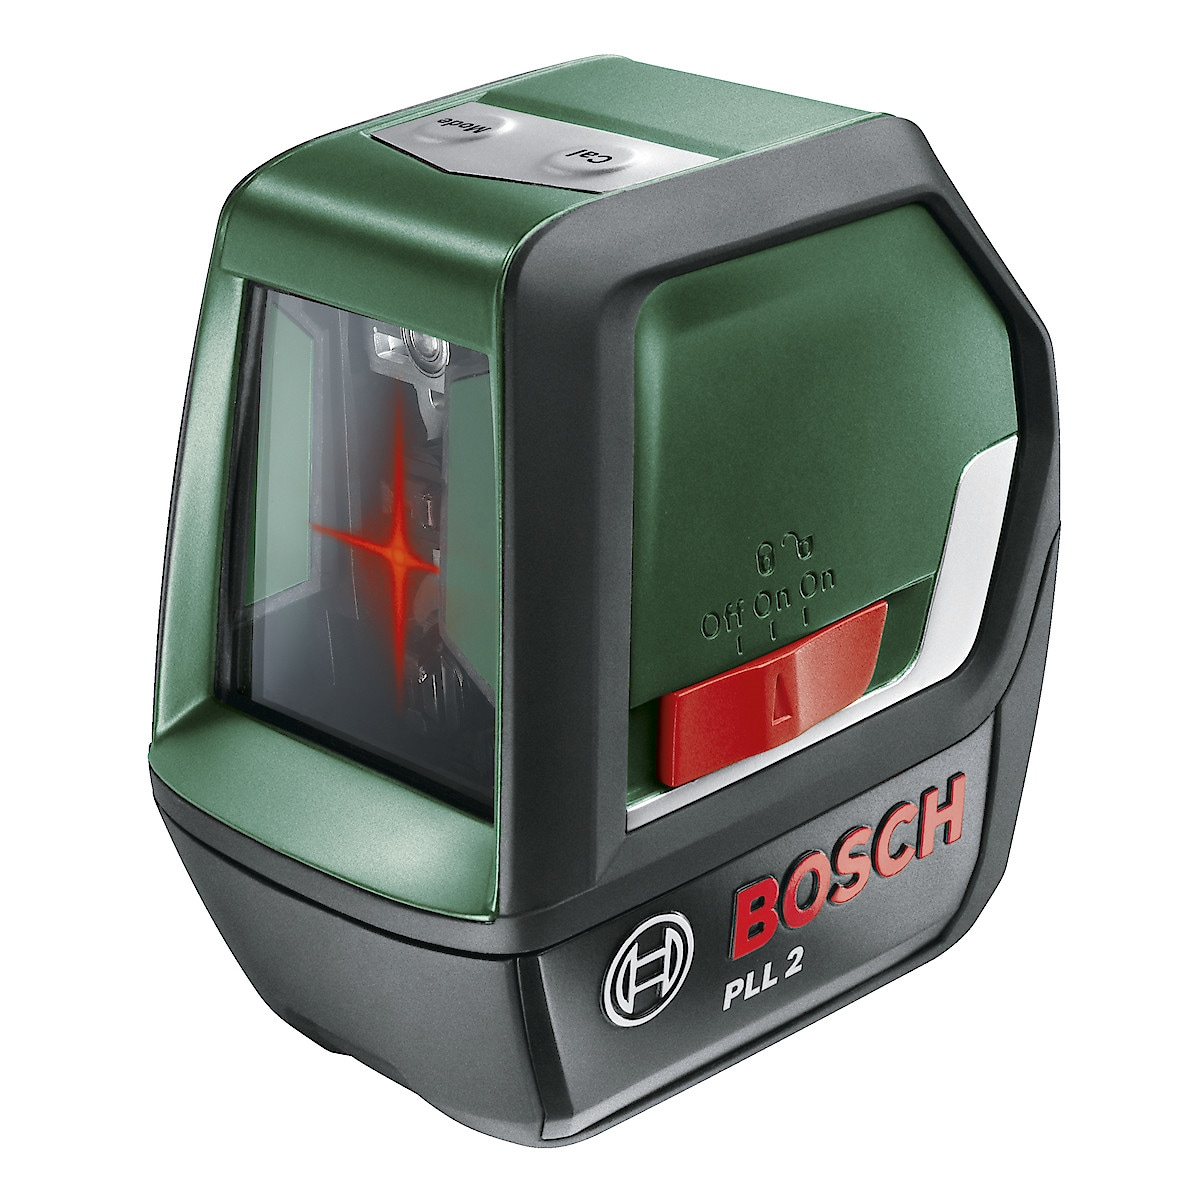 Krysslaser Bosch PLL2